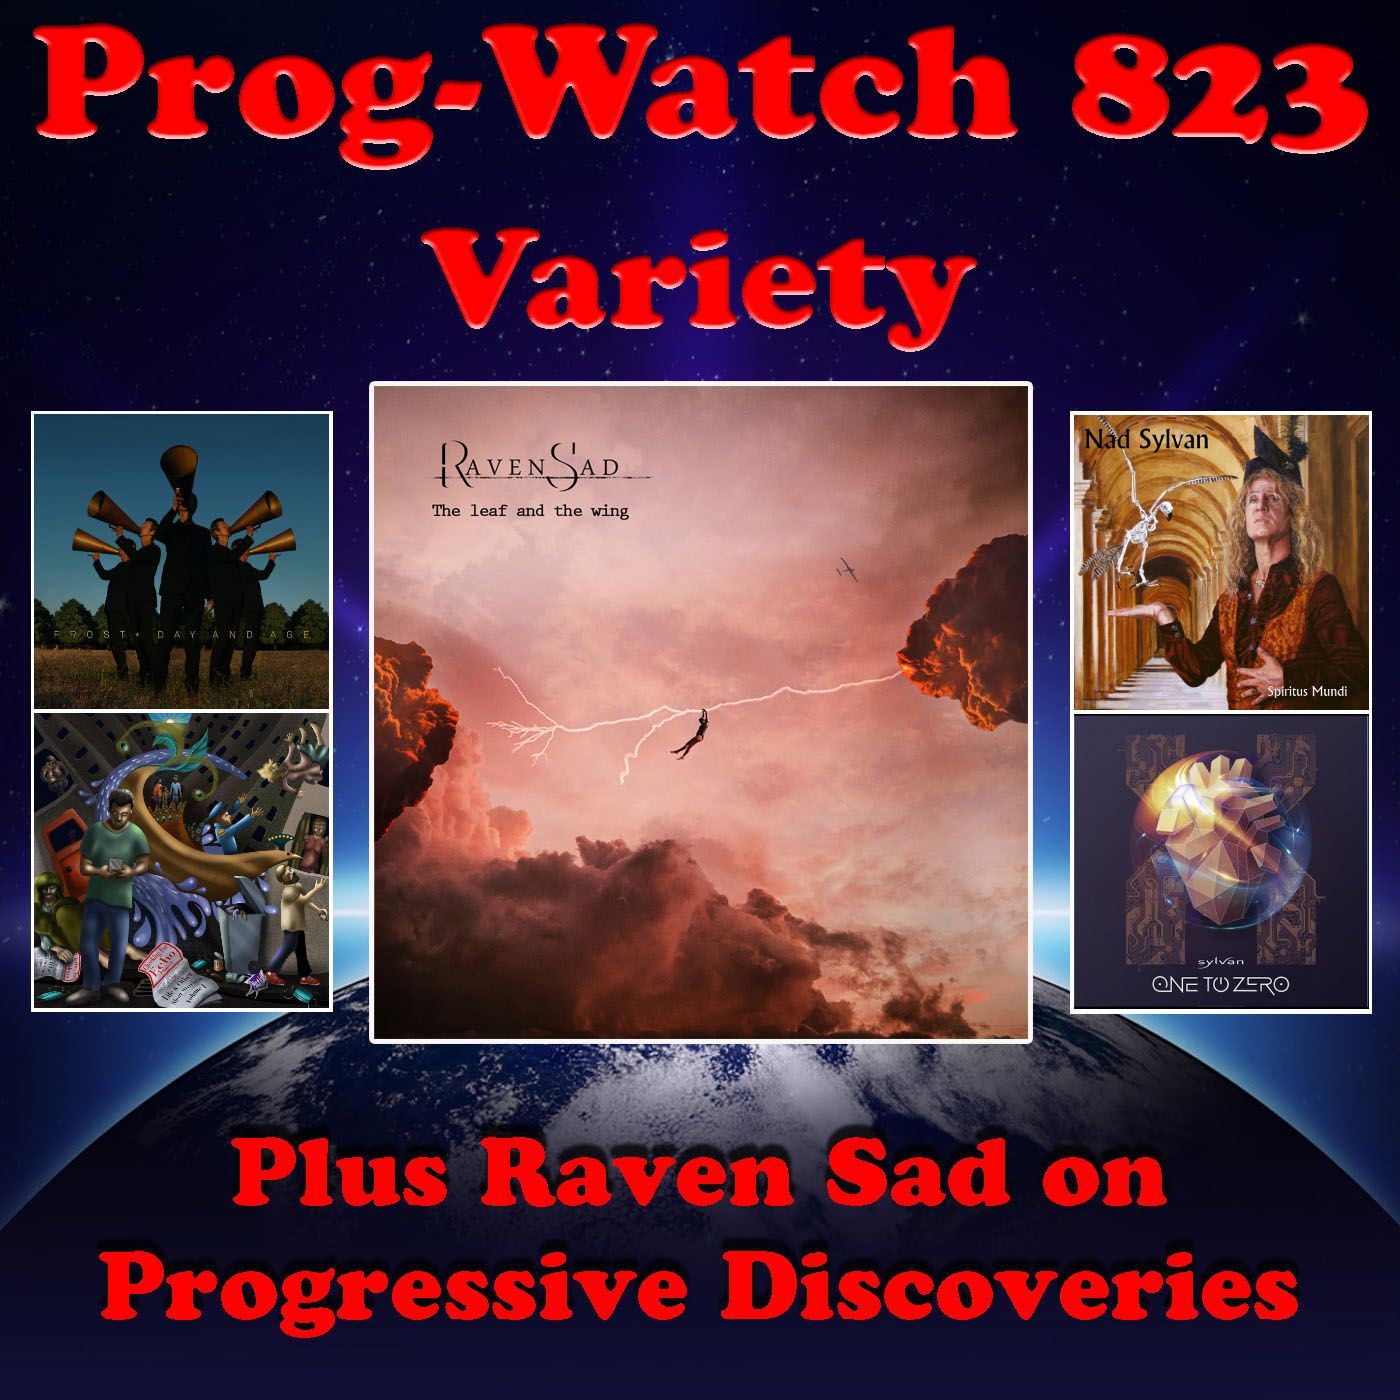 Episode 823 - Variety + Raven Sad on Progressive Discoveries